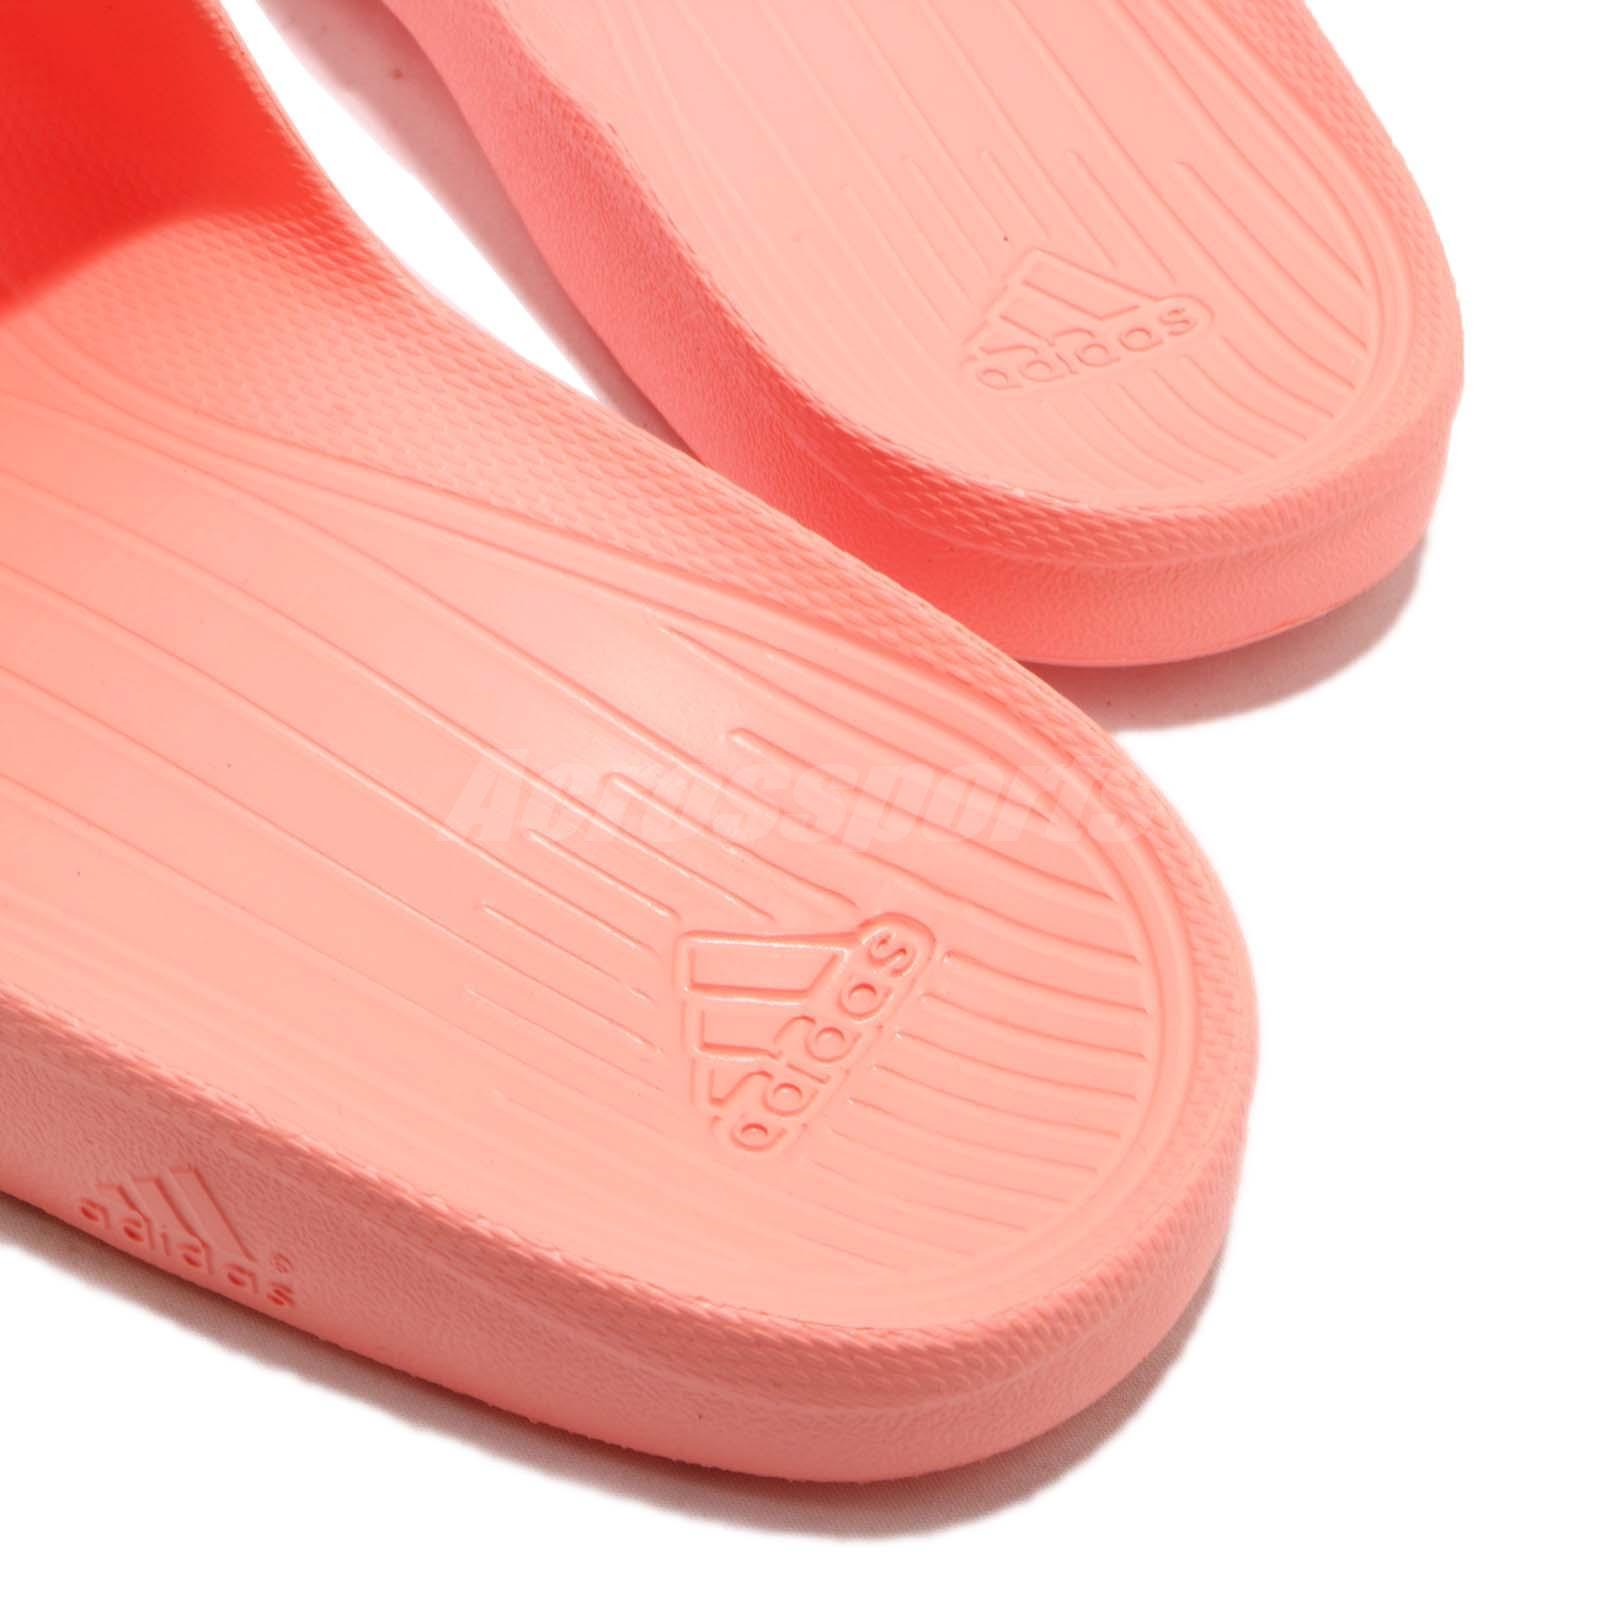 740bc0f749c6cf adidas Duramo Slide Chalk Coral Rubber Women Sports Sandal Slippers ...